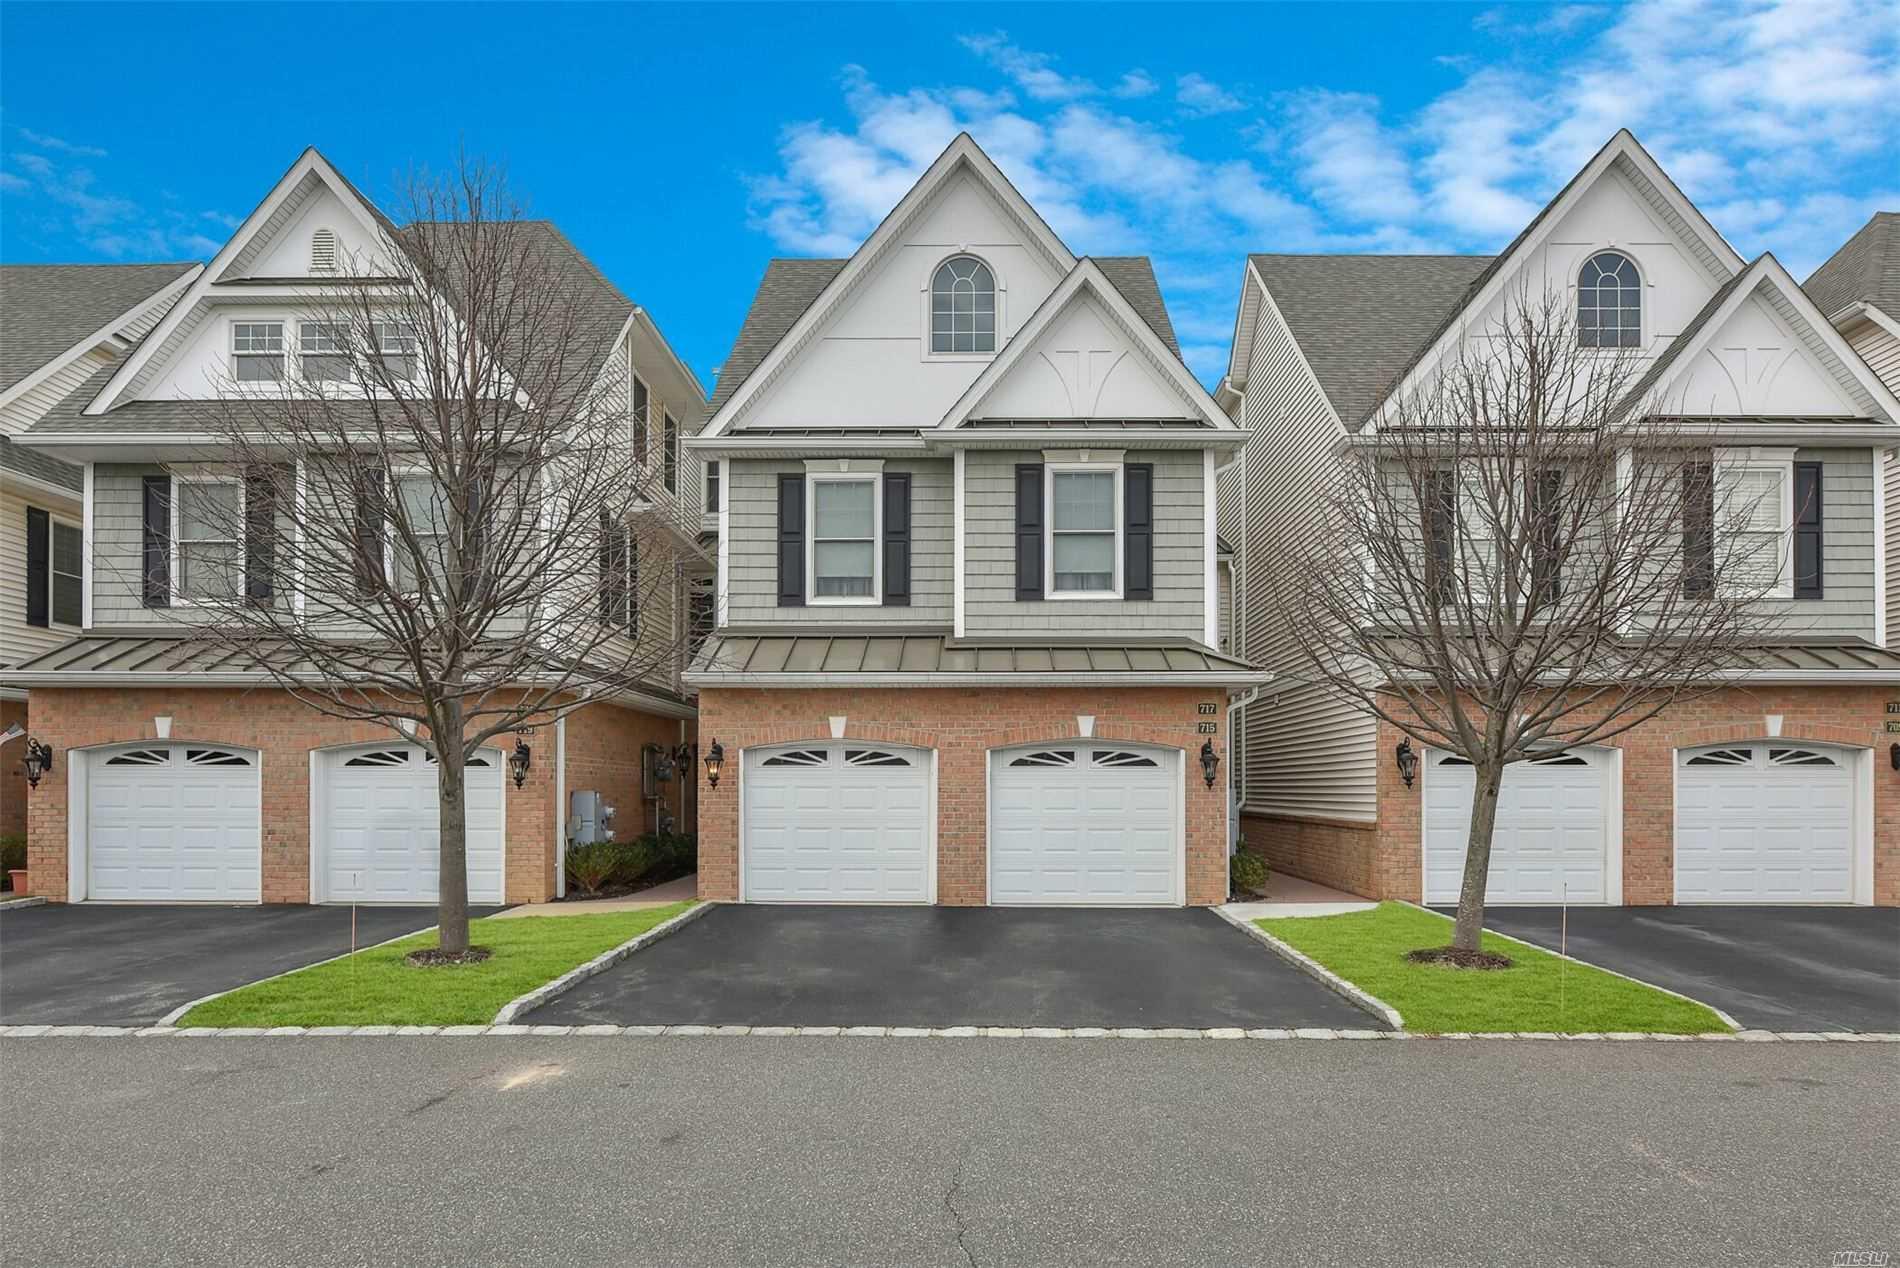 Property for sale at 715 Equestrian Way # 240, Westbury NY 11590, Westbury,  New York 11590